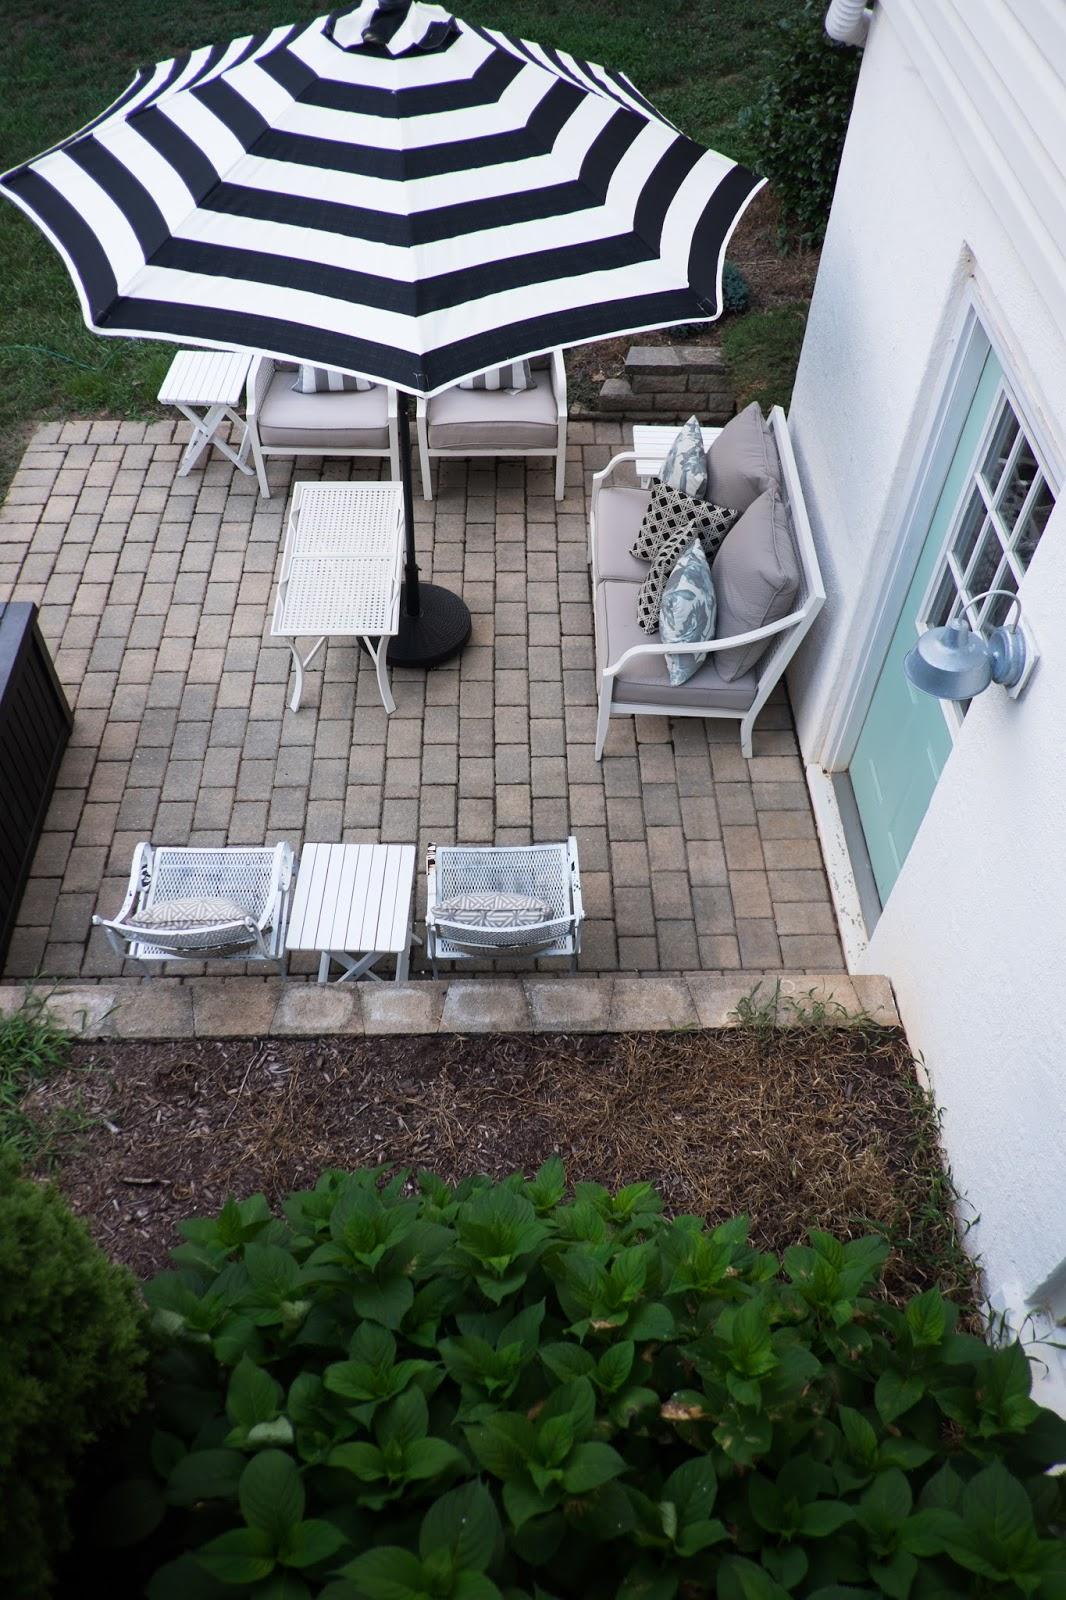 25b156c76b Domestic Fashionista: Backyard Patio Umbrellas